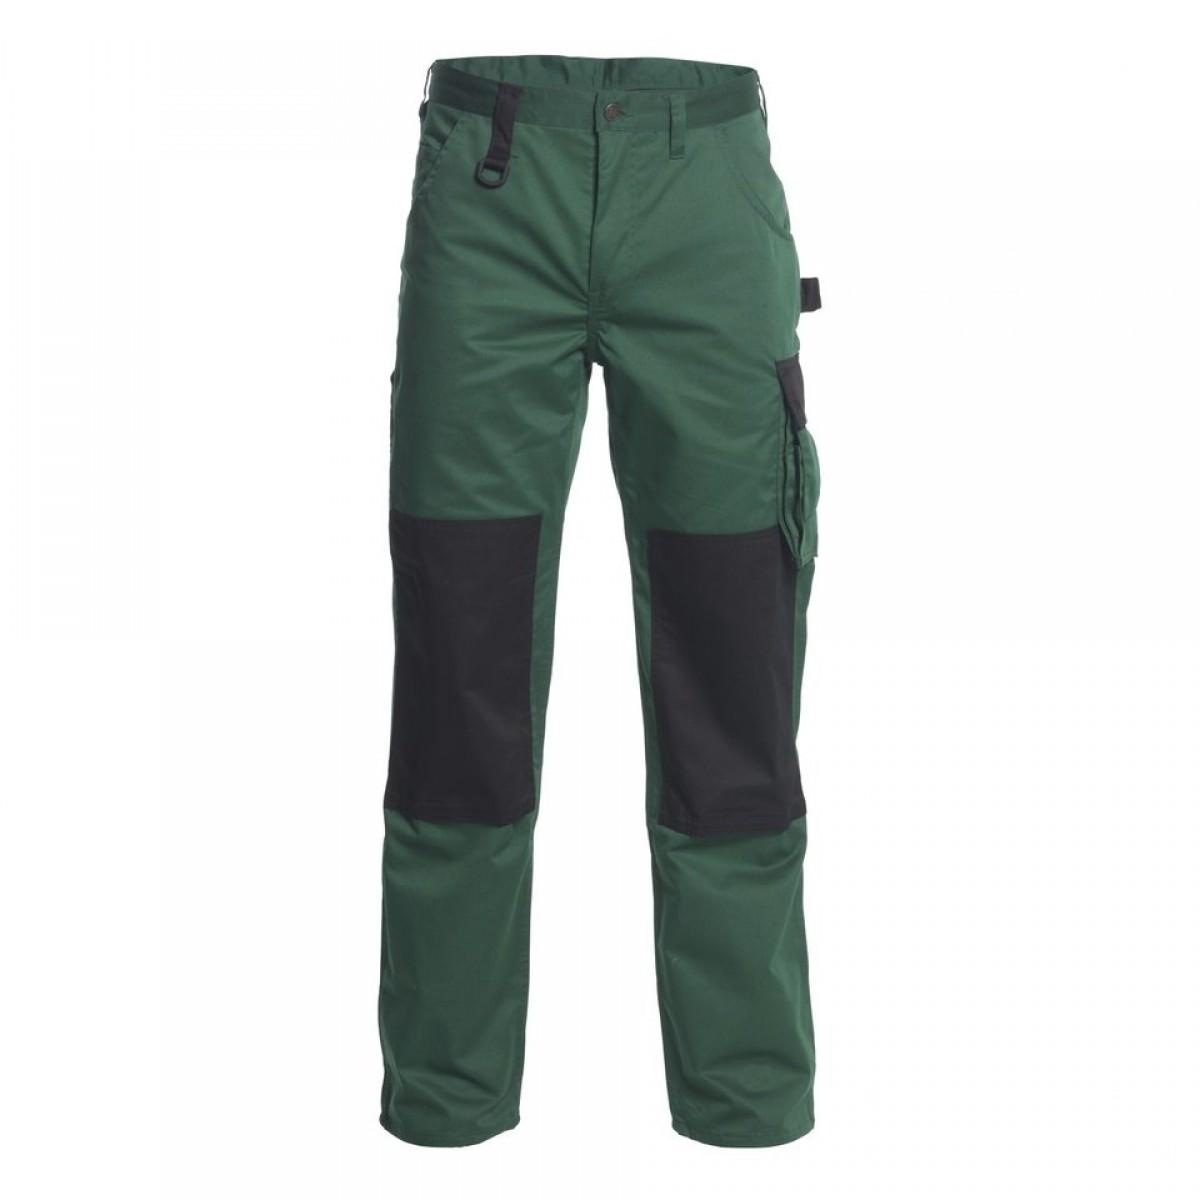 Grøn/sort